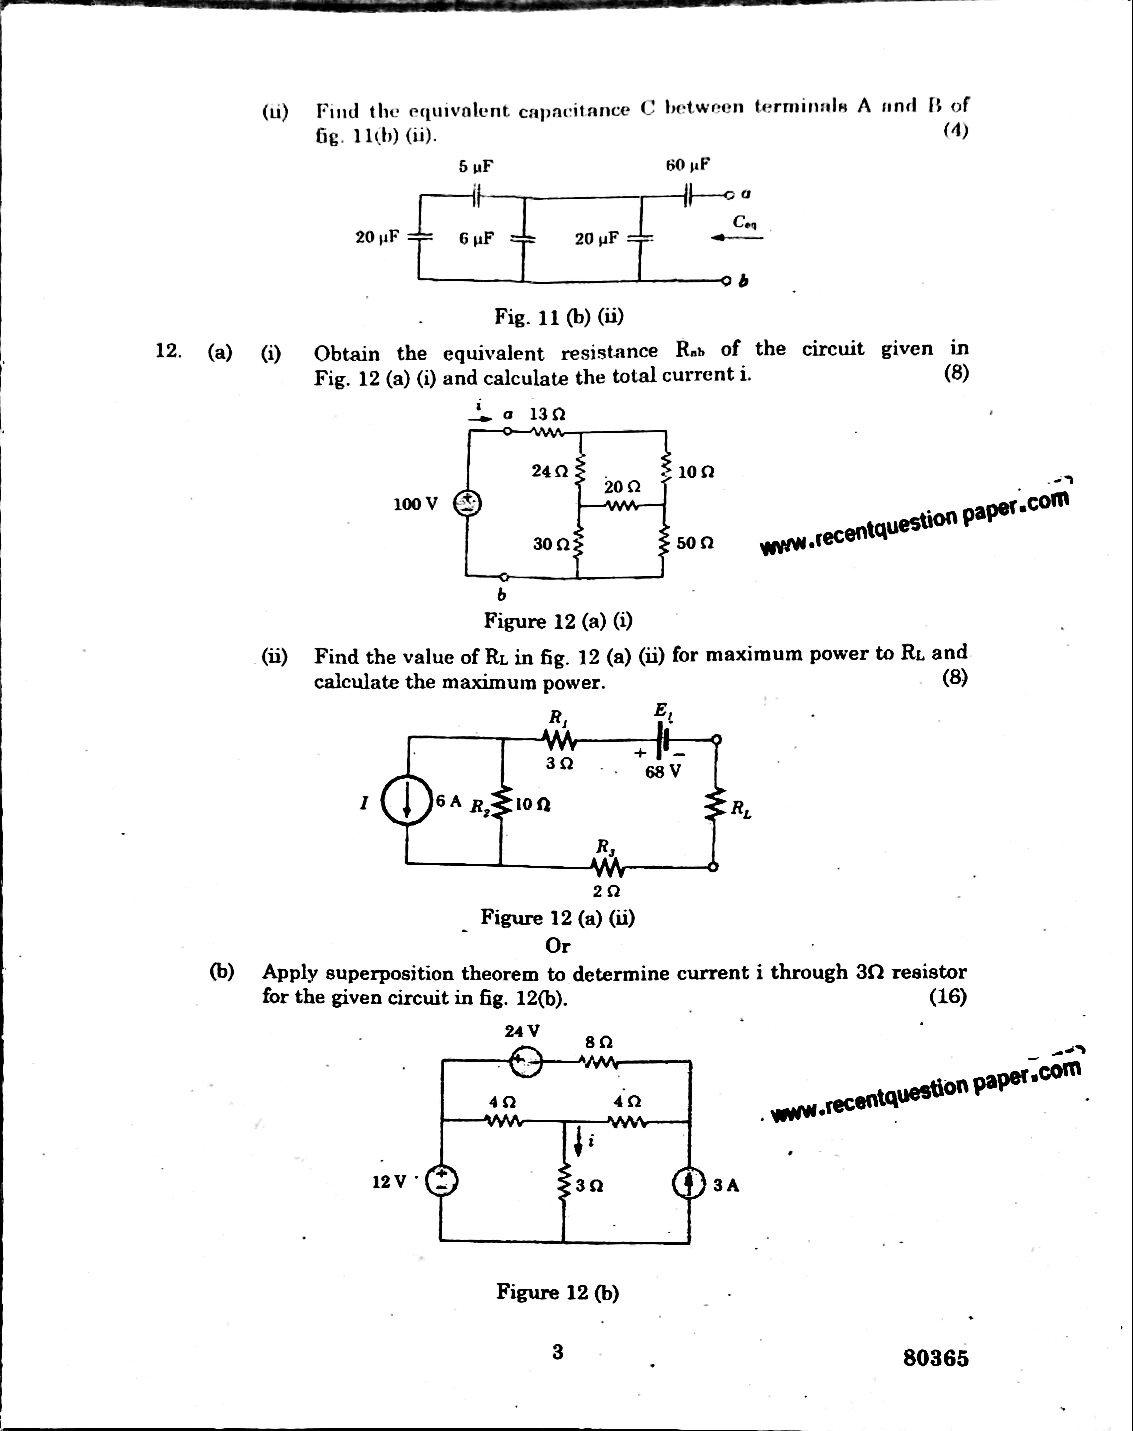 Circuit Theory Anna University Question paper Nov/Dec 2016